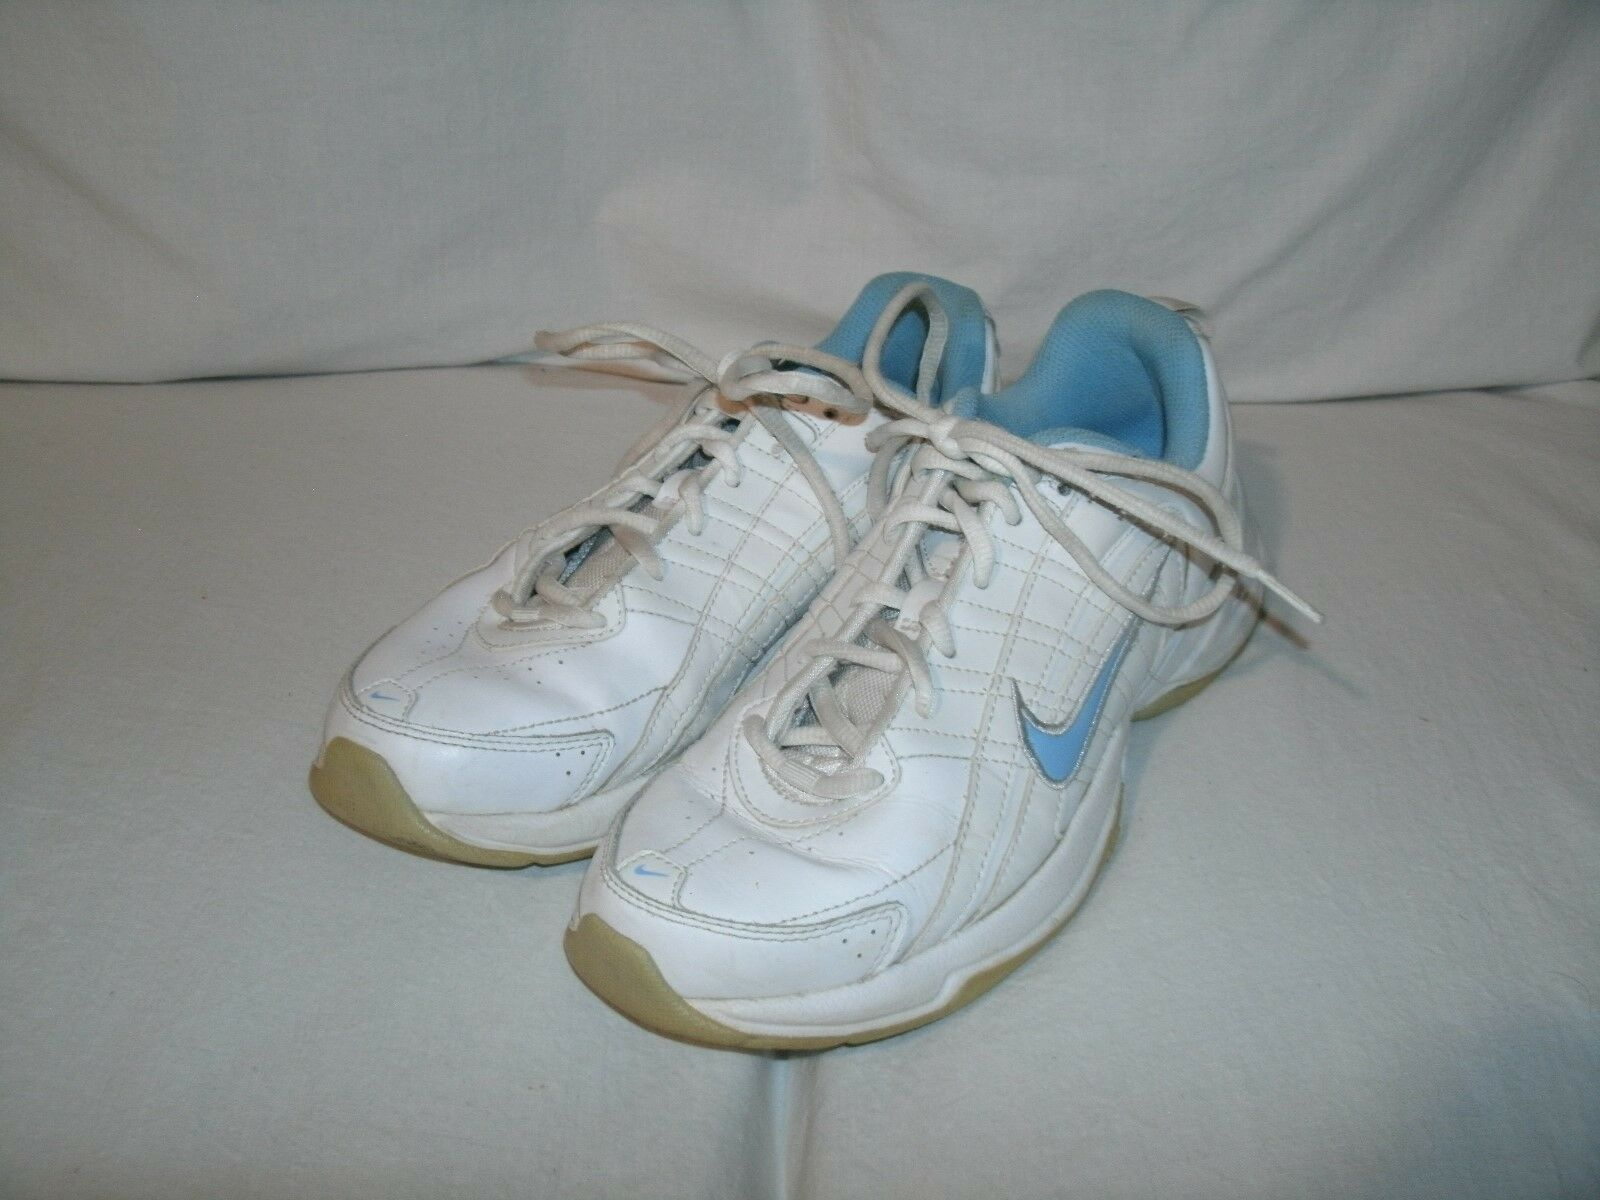 NIKE AIR Women's Running Trail Athletic Shoes White Blue 386508-141 sz 7.5